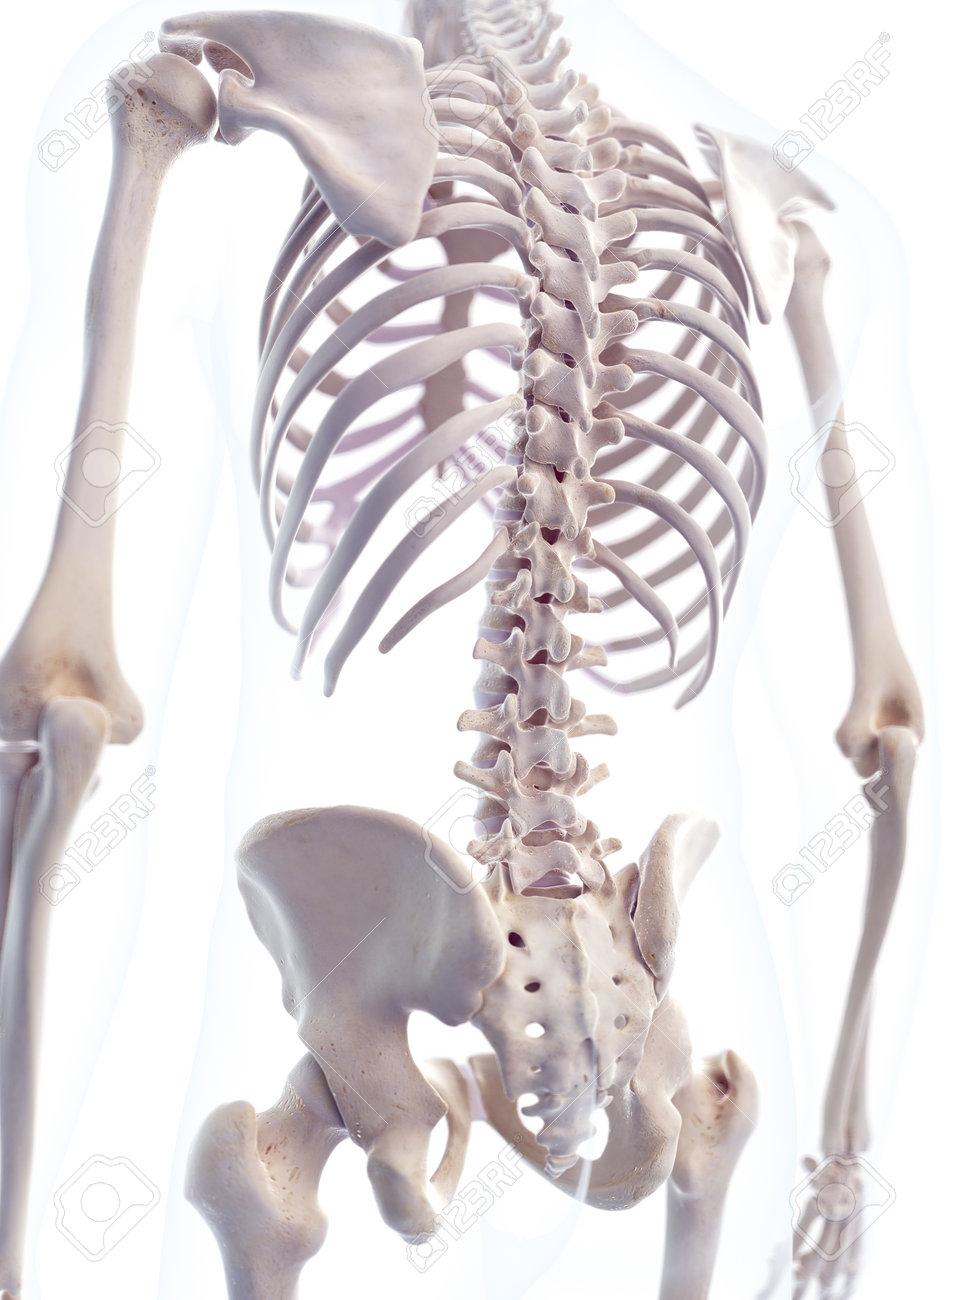 Médicamente Exacta 3d Ilustración De La Columna Vertebral Humana ...